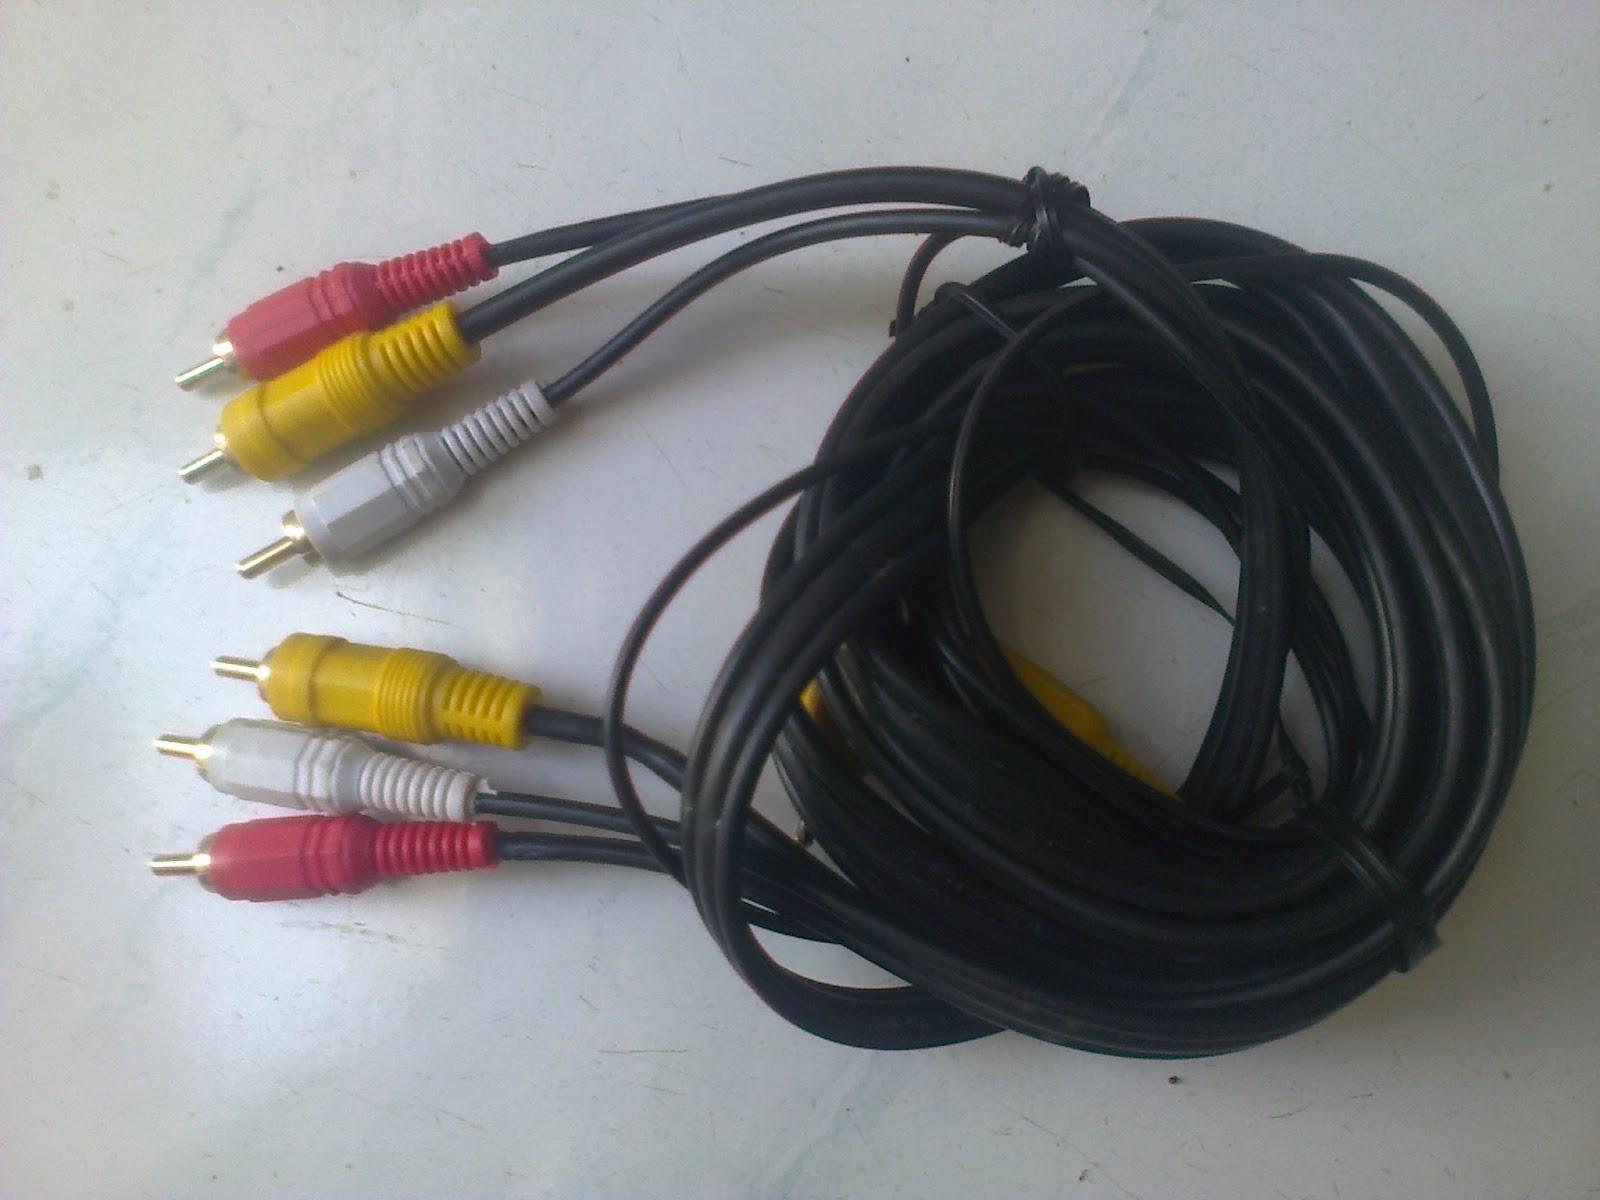 Hawila Multimedia Sewa Kabel BNC, RCA Jakarta Pusat, Selatan, Jakarta Barat, Jakarta Timur, Utara